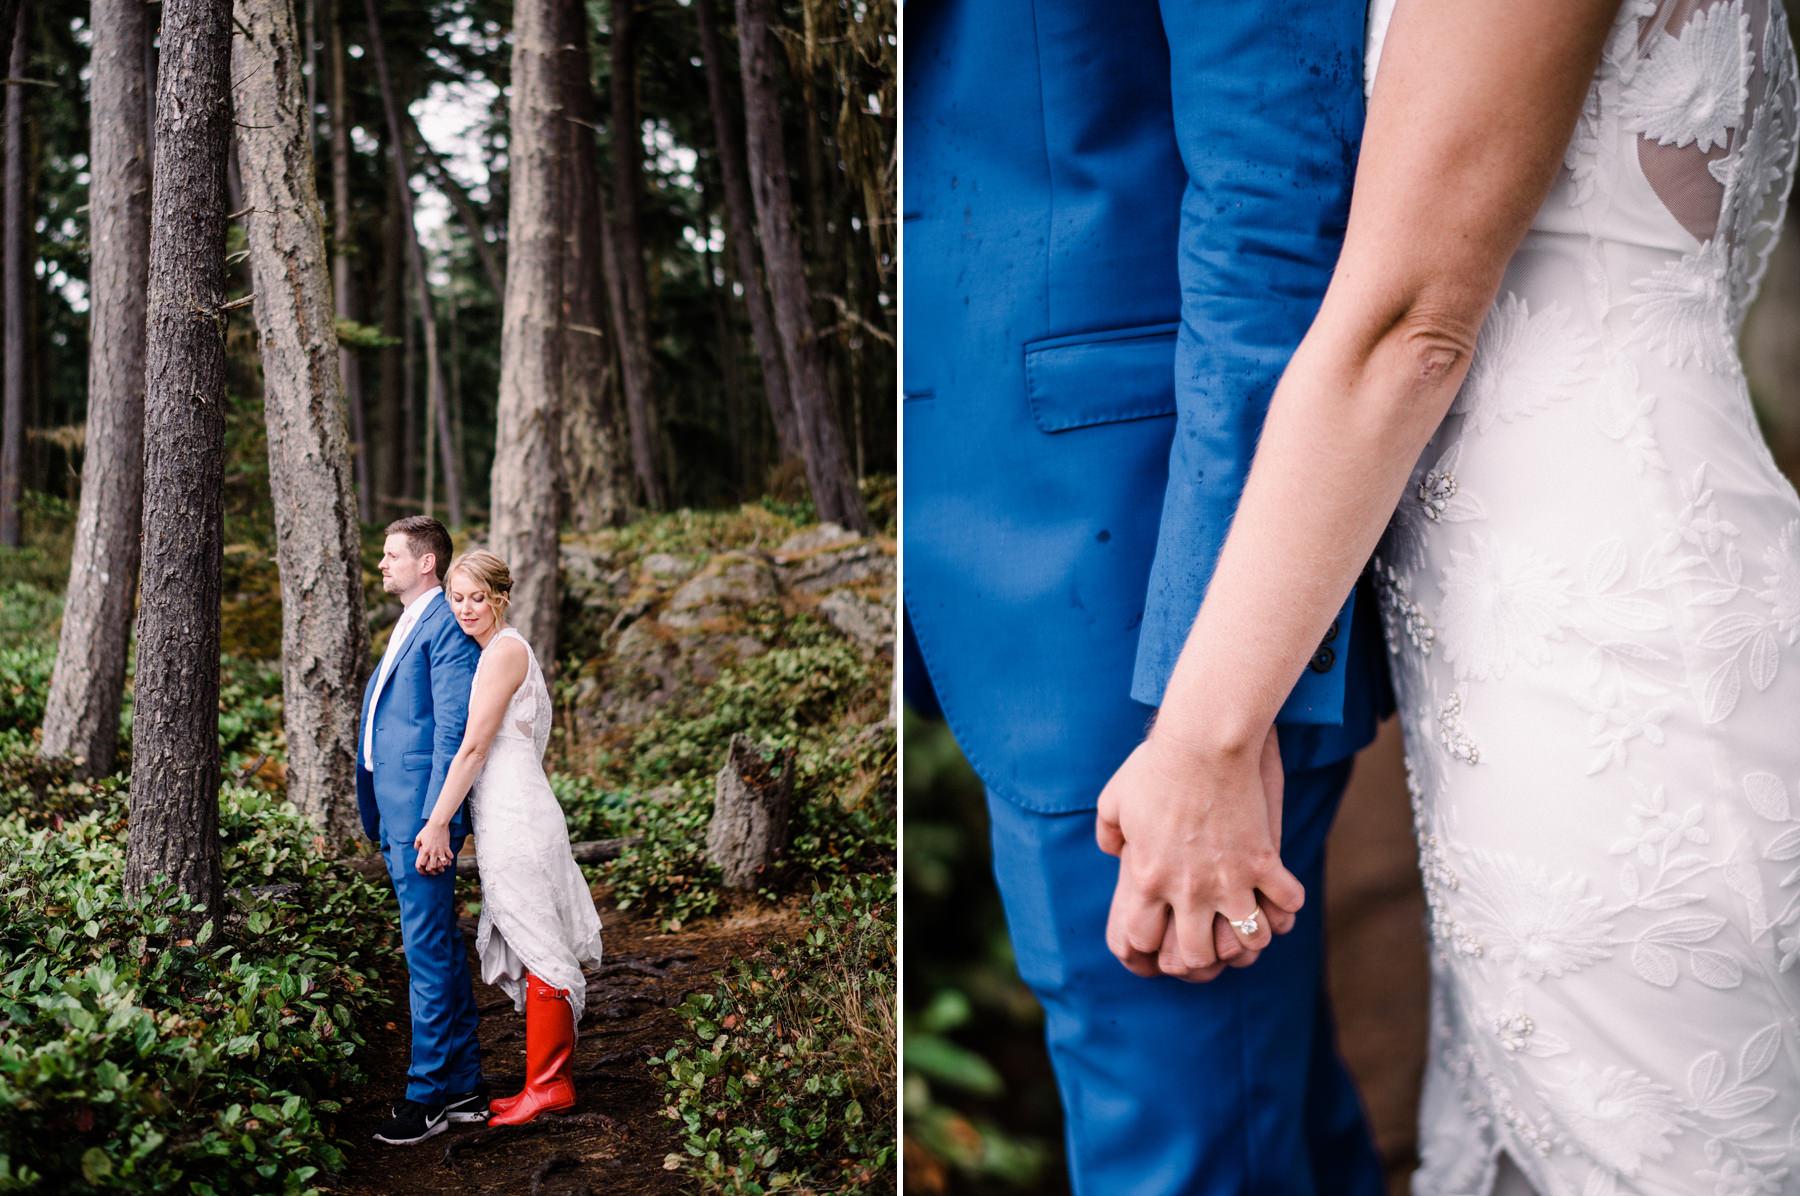 286-colorful-outdoor-lopez-island-wedding.jpg